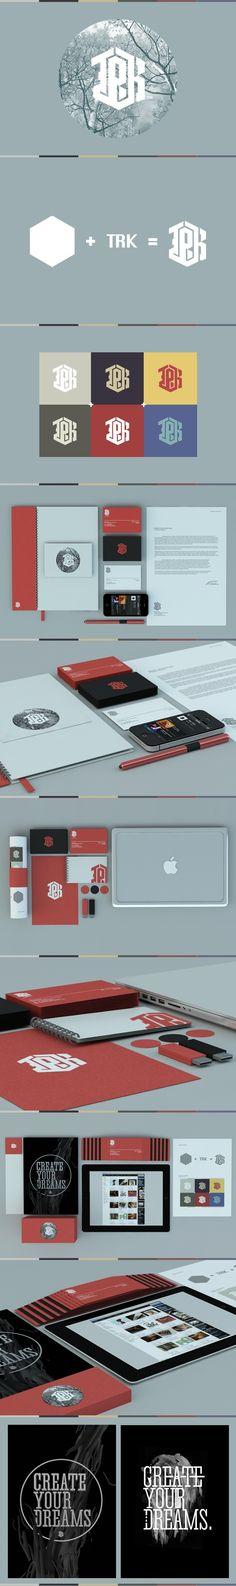 Peter Tarka identity system | #stationary #corporate #design #corporatedesign #identity #branding #marketing < repinned by www.BlickeDeeler.de | Take a look at www.LogoGestaltung-Hamburg.de